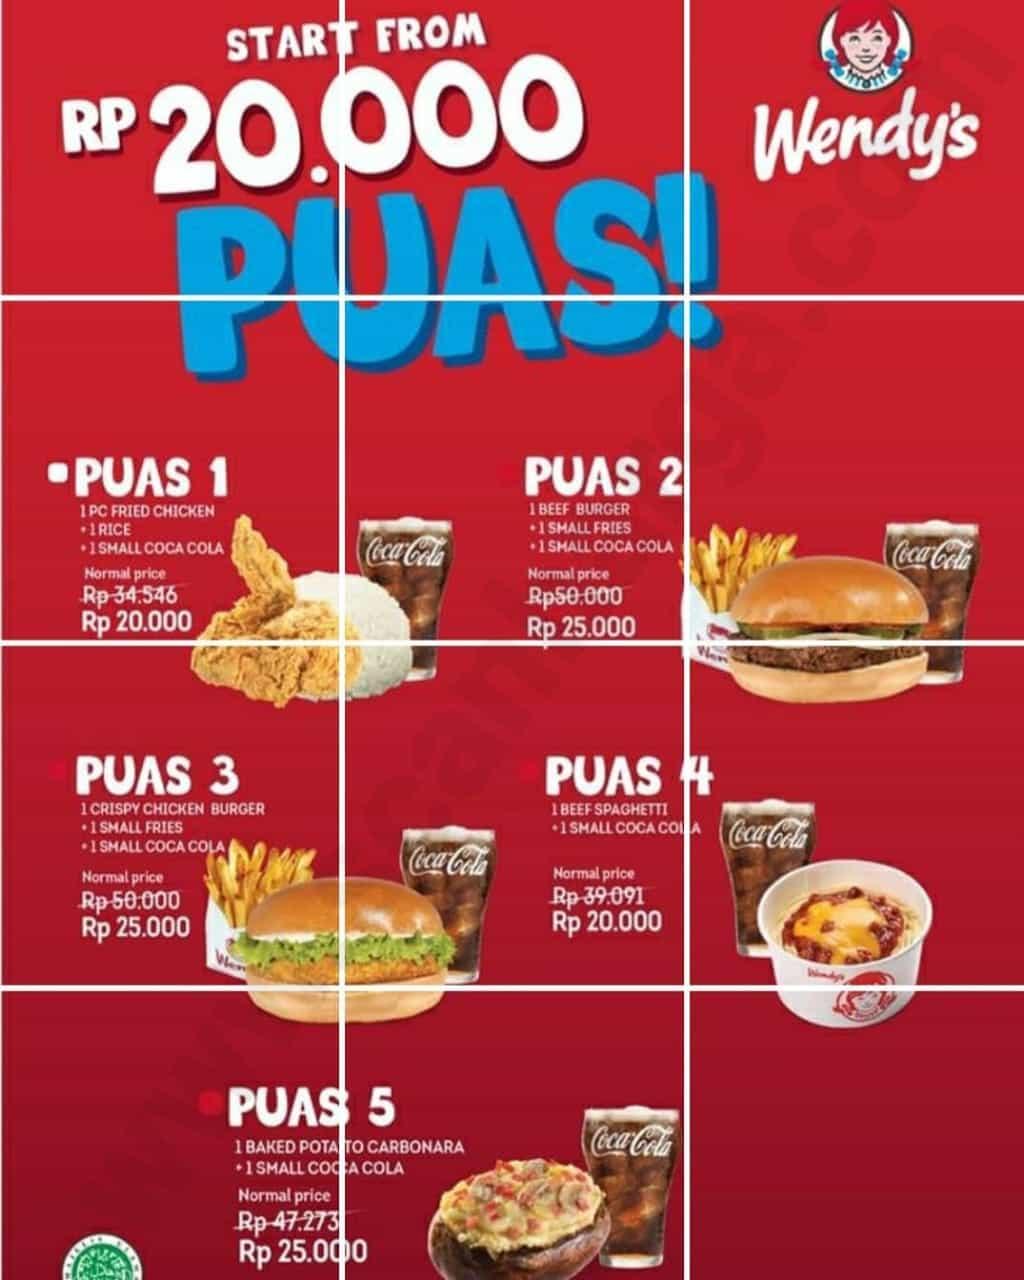 Promo Wendys Paket Puas Cuma 20 000 Edisi Juli 2020 Scanharga Harga Promo Indomaret Alfamart Giant Alfamidi Superindo Lottemart Carrefour